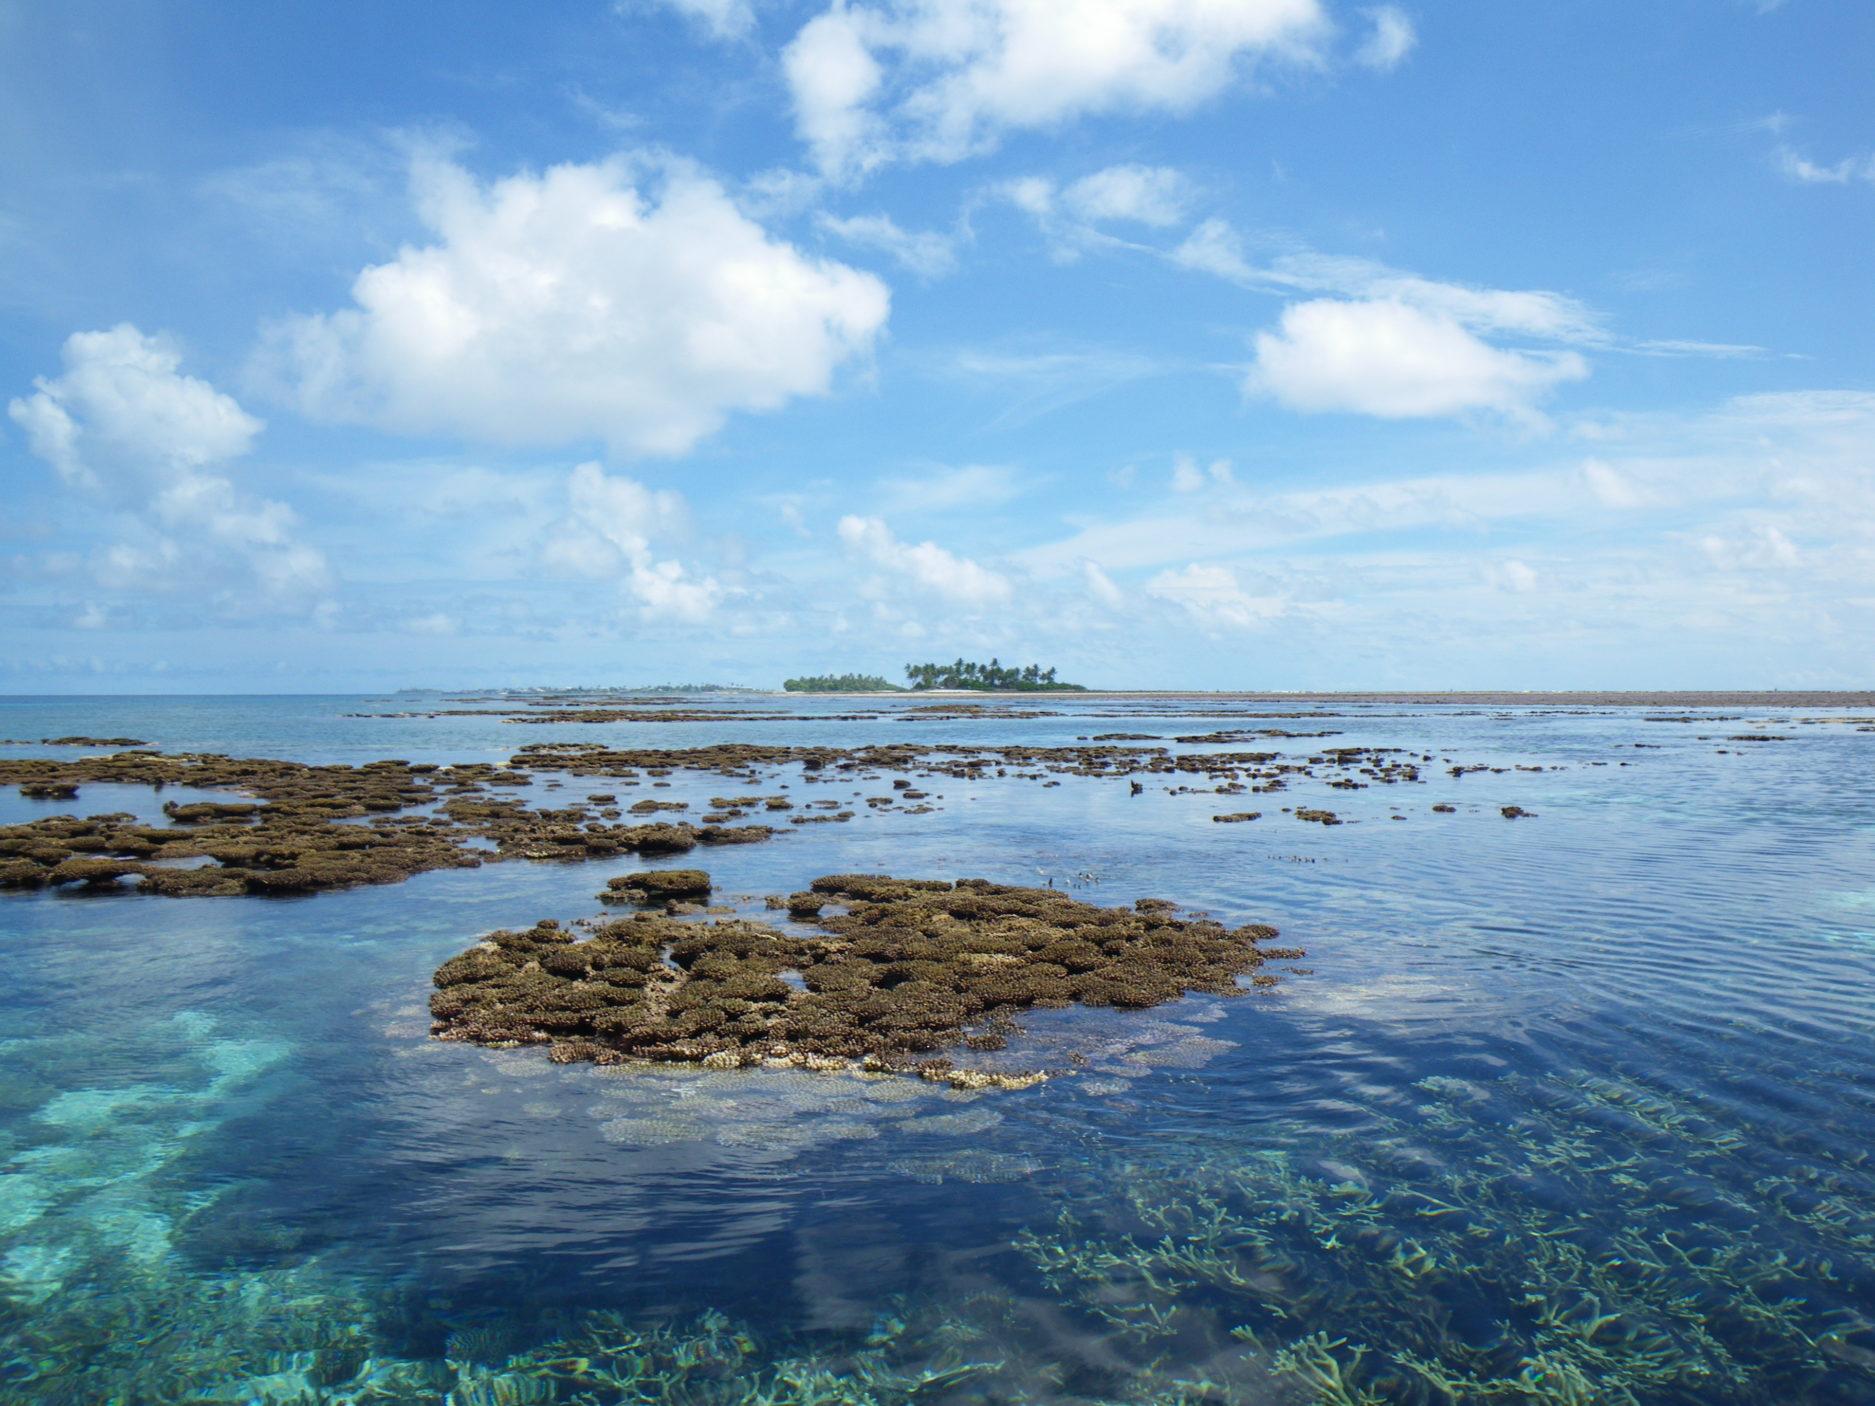 Marshall Islands [Shutterstock]